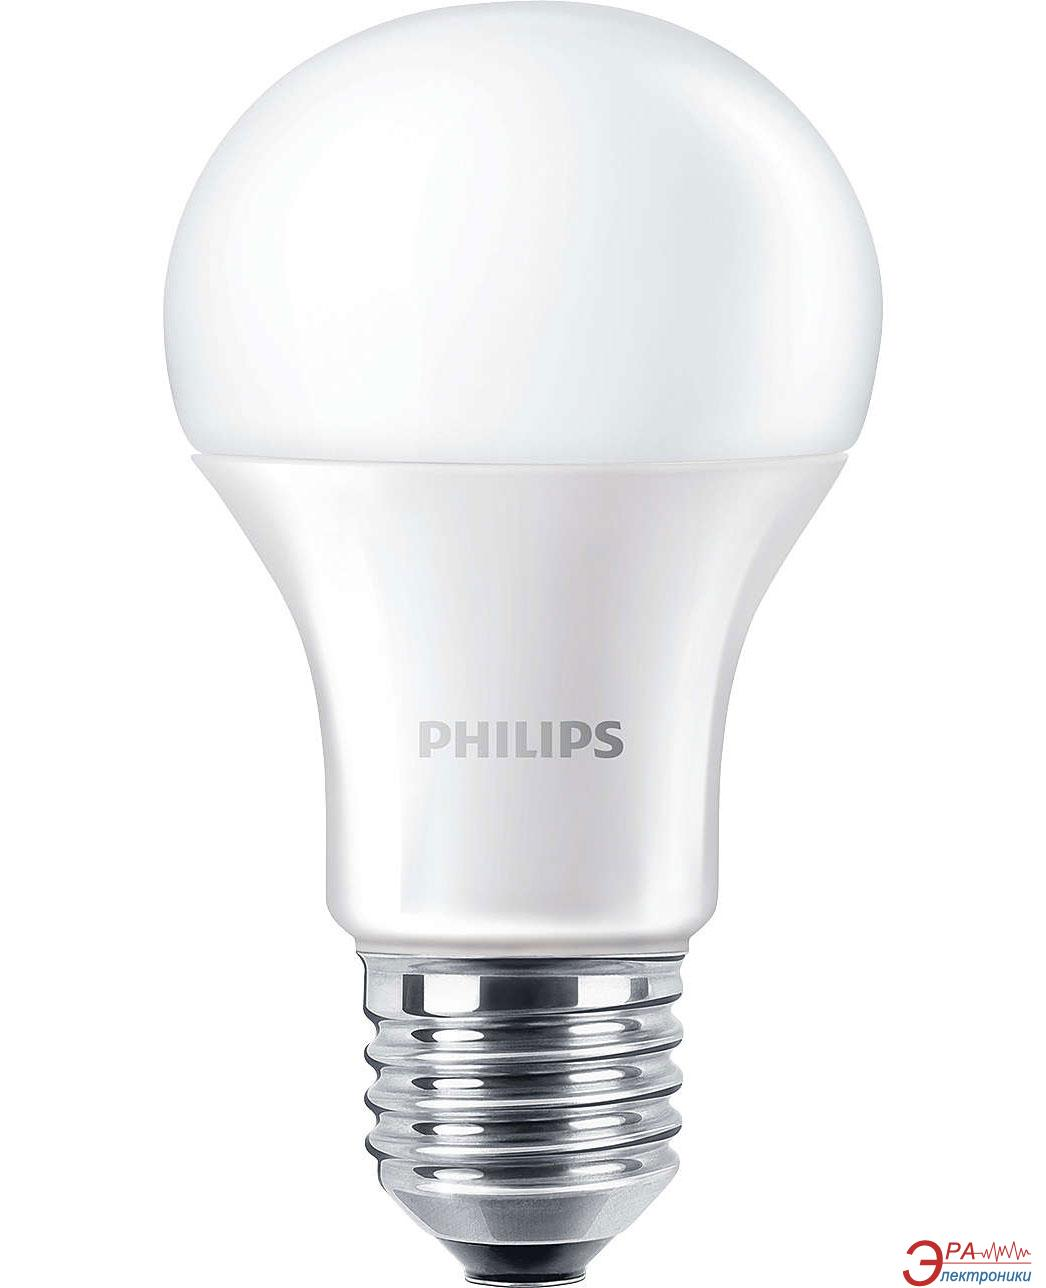 Светодиодная лампа Philips LEDBulb E27 9.5-60W 230V 4000K A60/PF CorePro (929001179602)